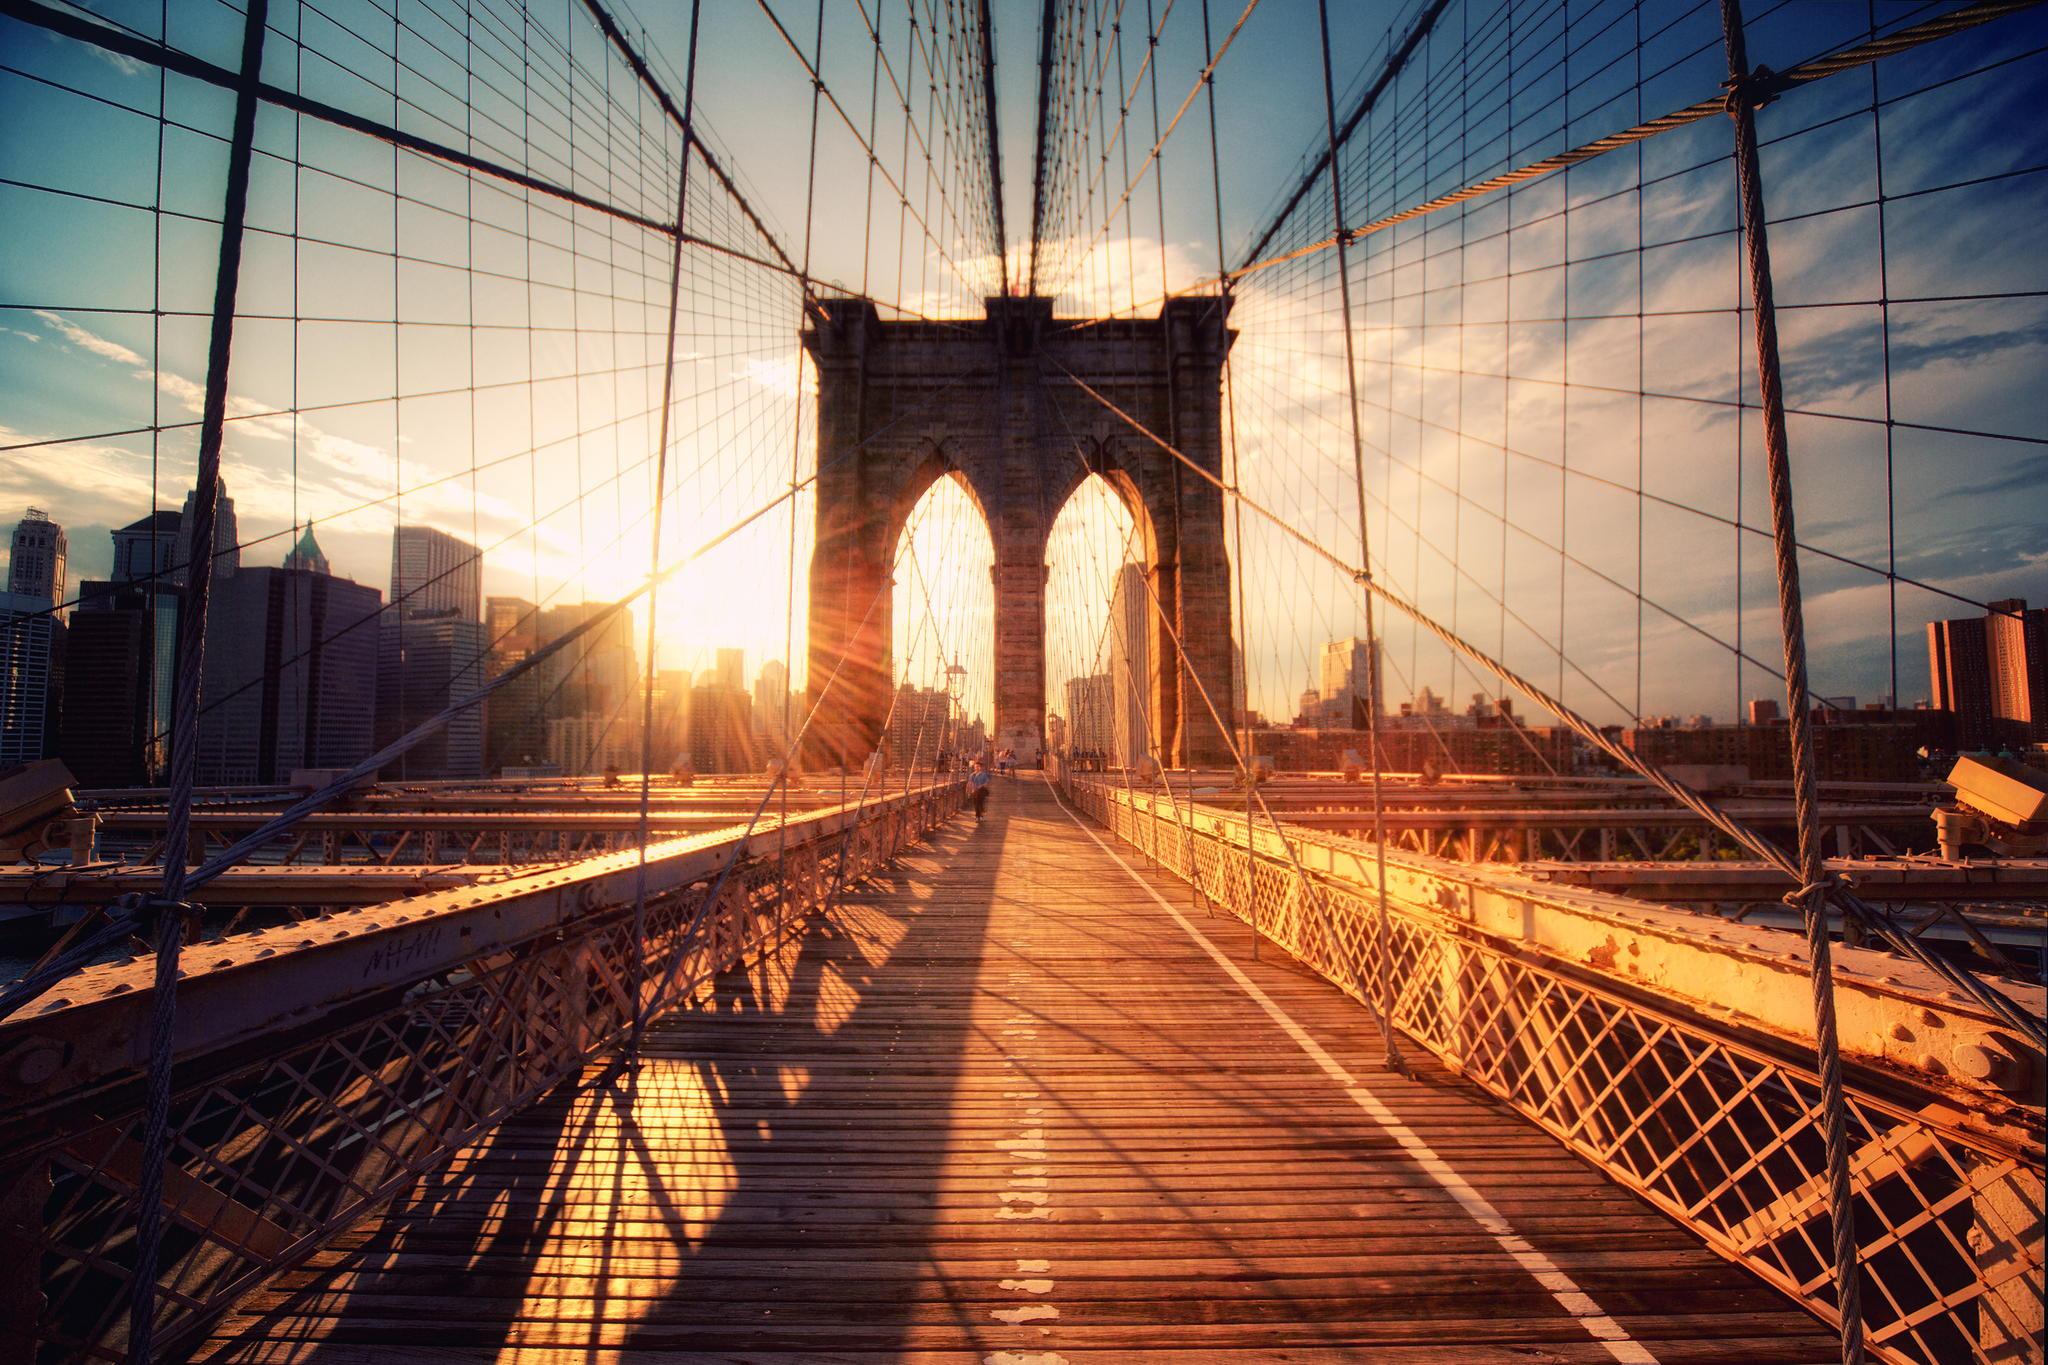 """Brooklyn Bridge Sunset"" by Philipp Klinger"